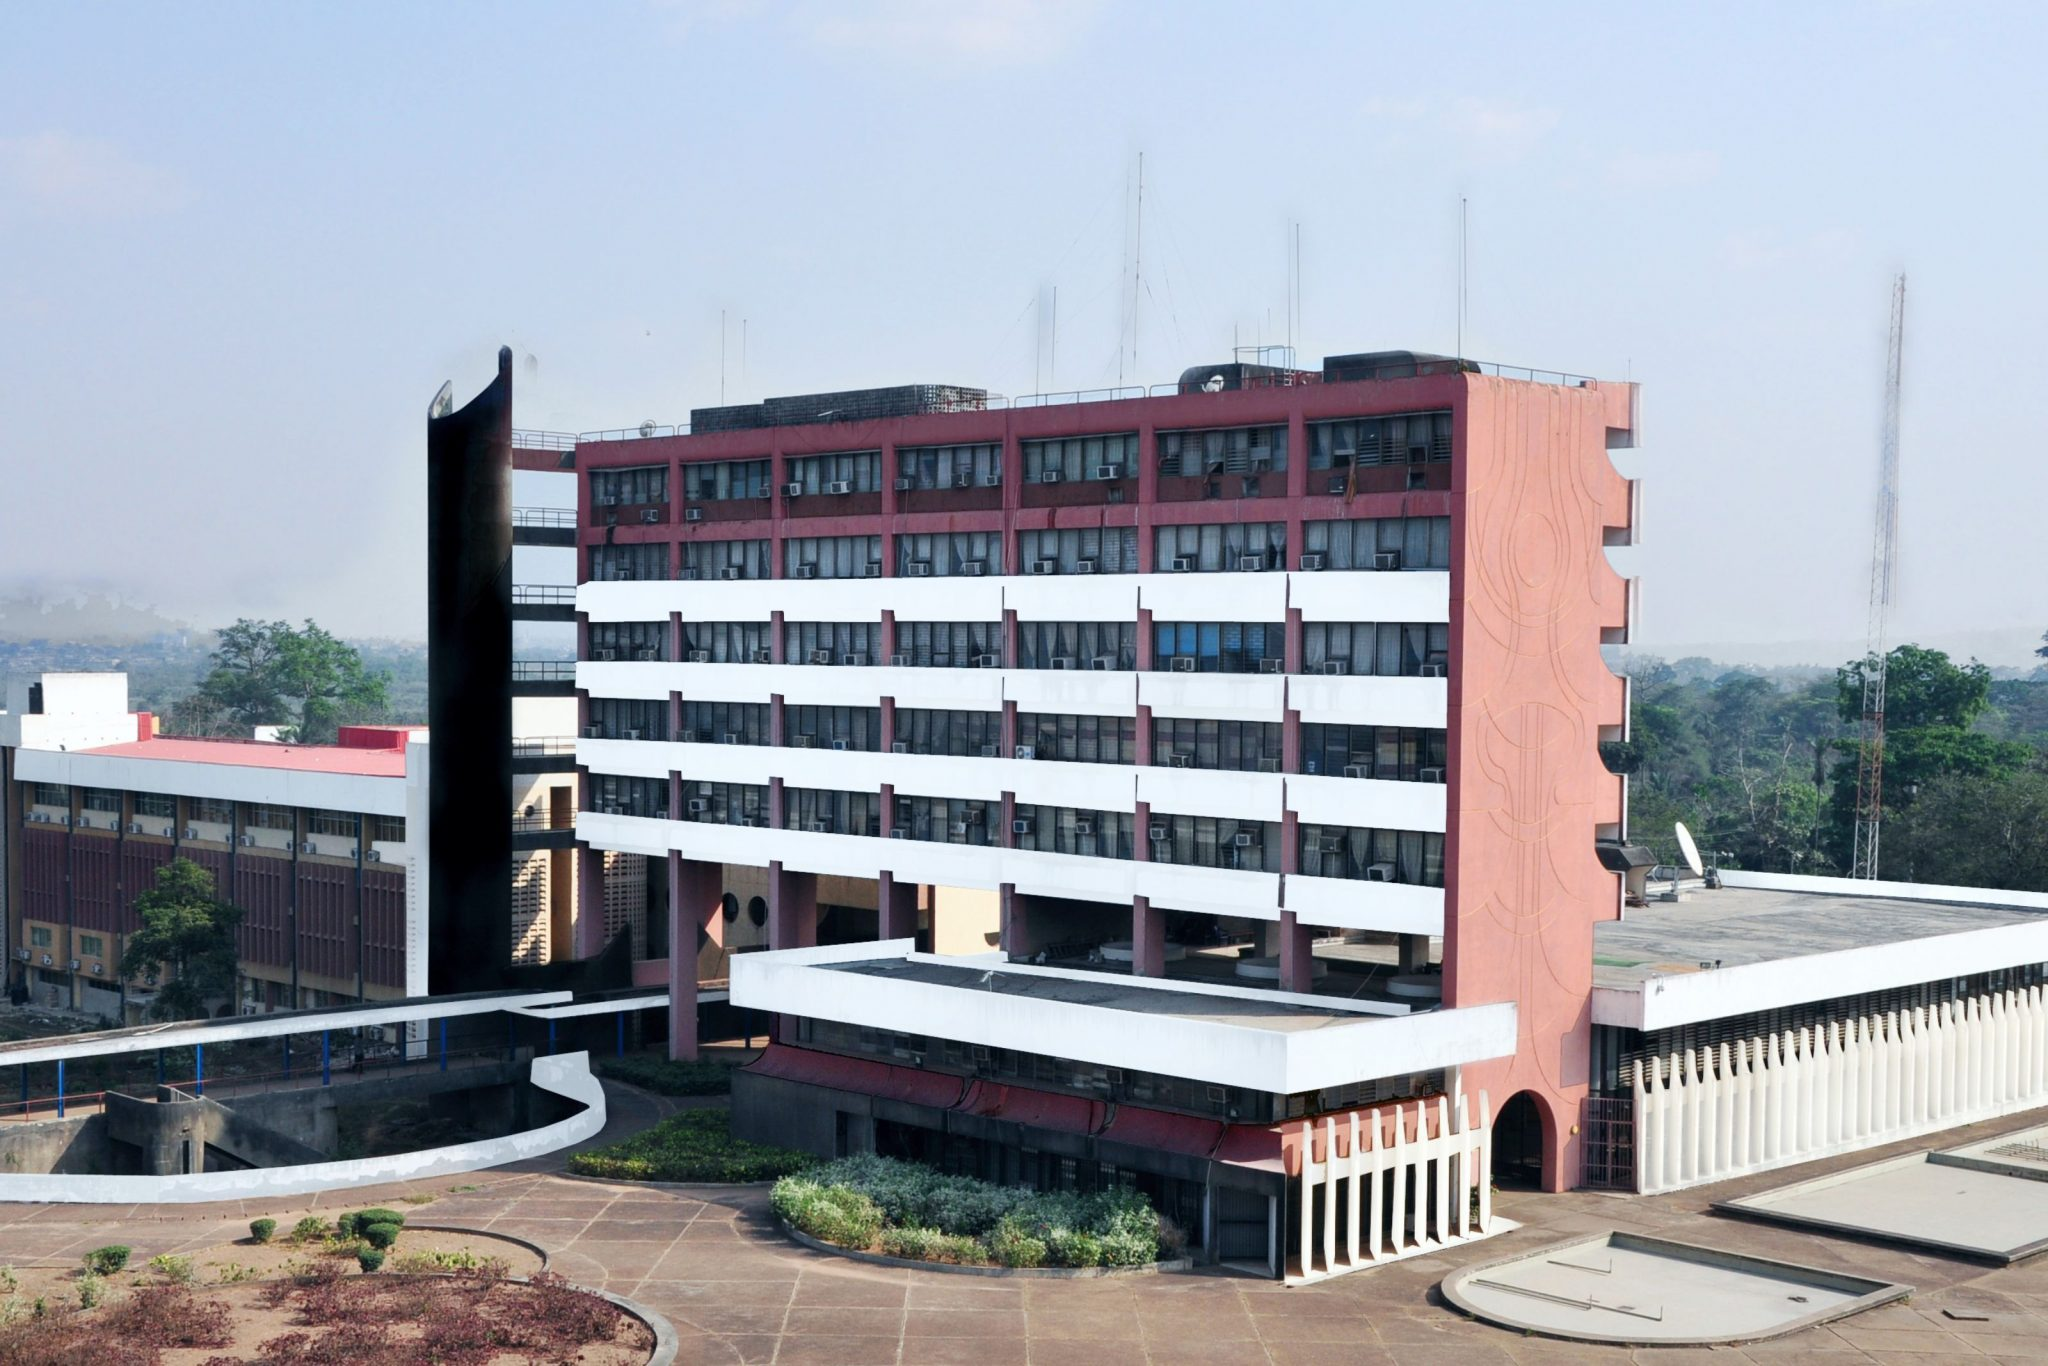 Obafemi Awolowo University Administrative Building, Ife